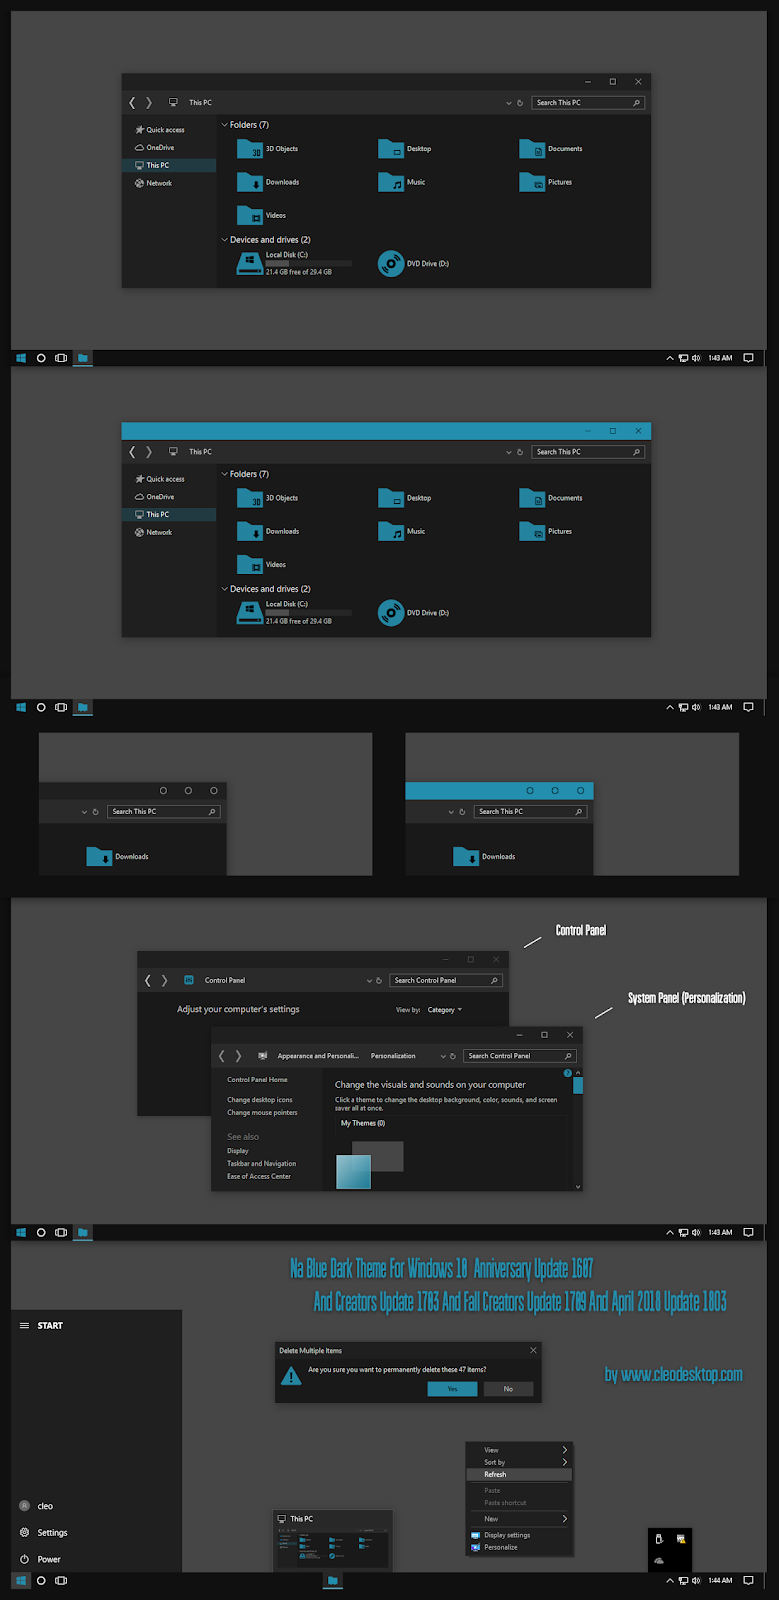 windows10 themes i cleodesktop na blue dark theme windows10 april